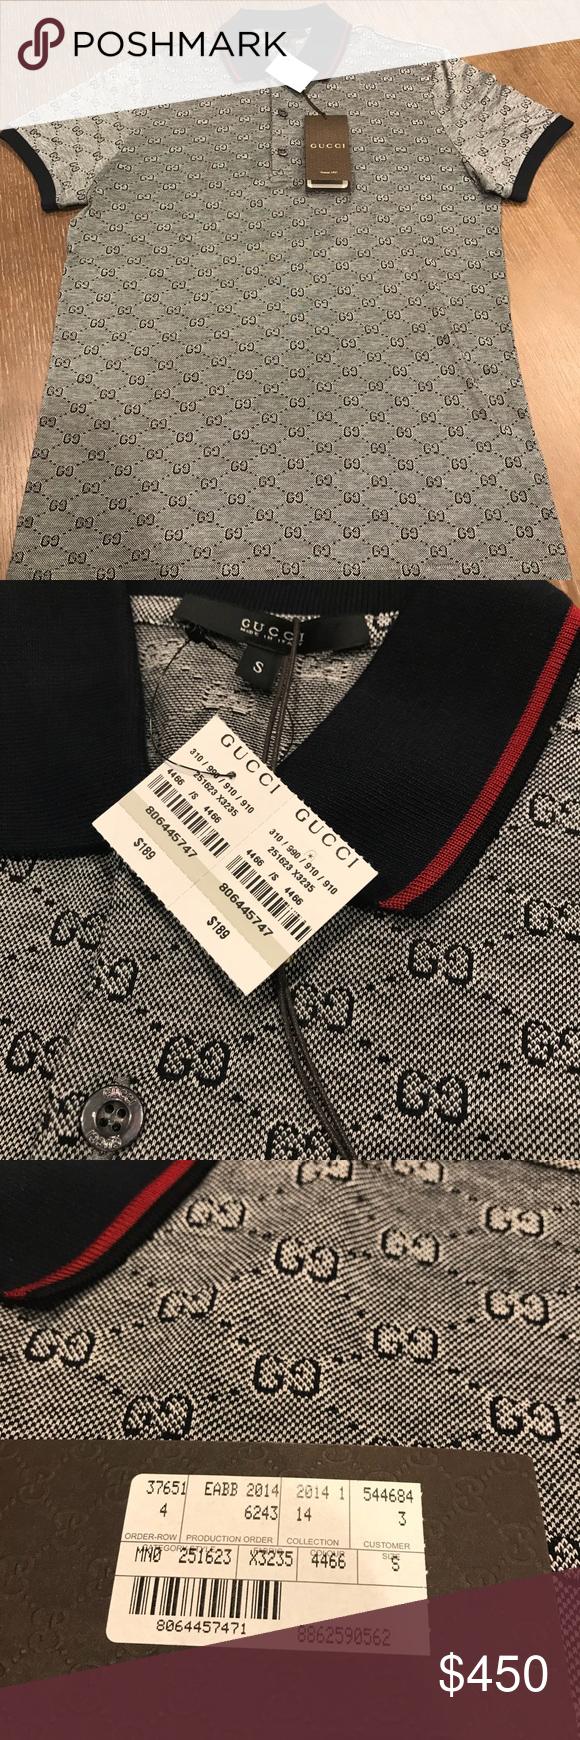 34d86a54 Gucci GG pattern polo Gucci GG polo Size small = mens 36-38 chest 100